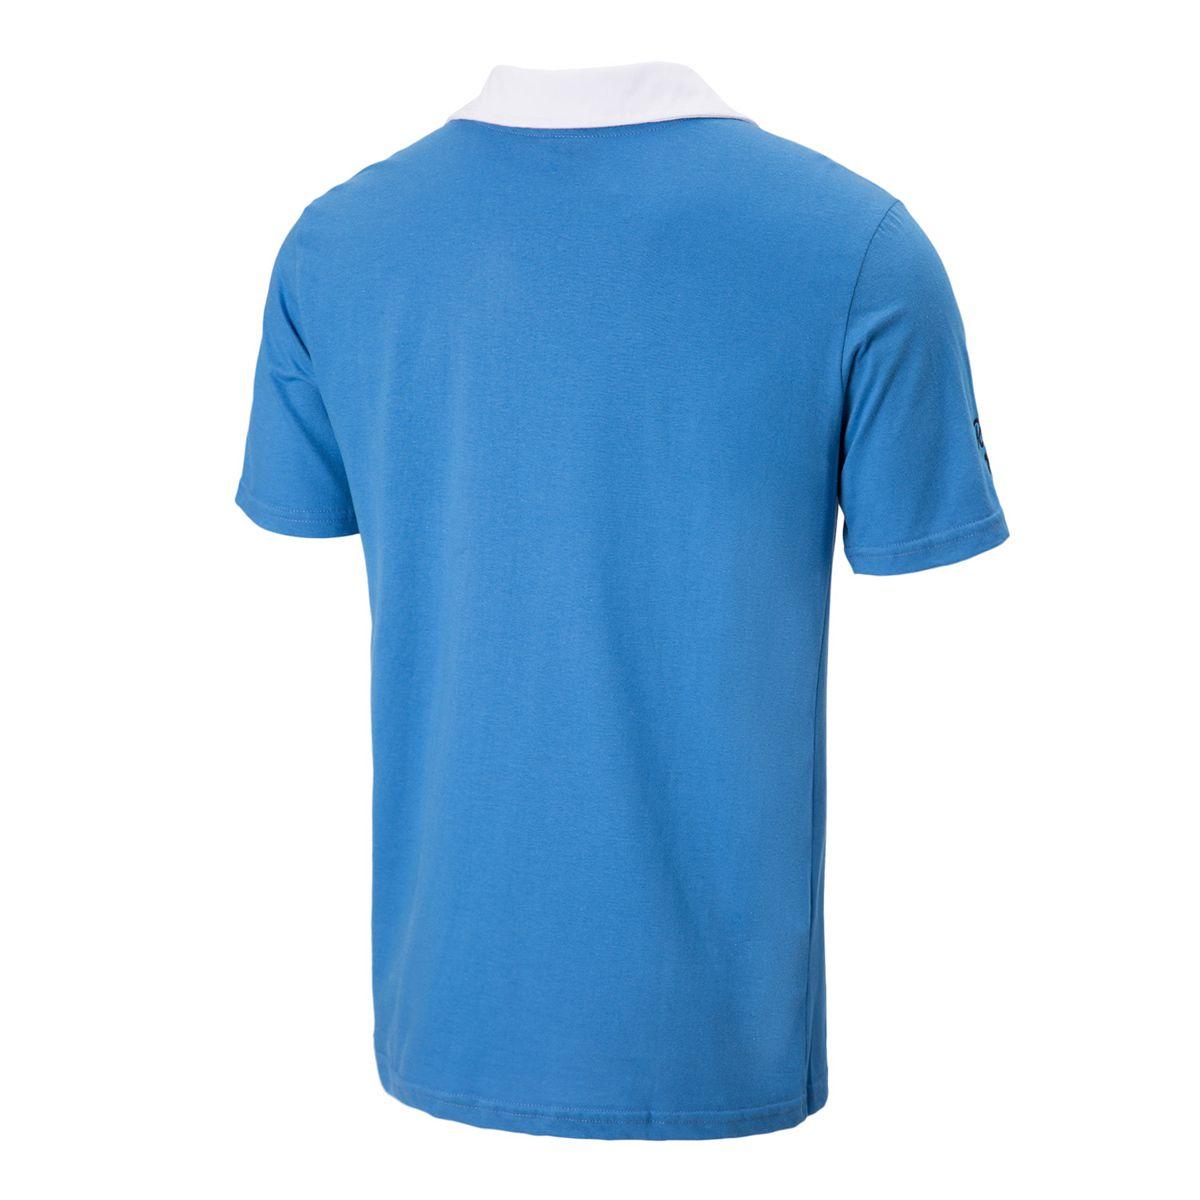 Camisa Polo Grêmio Retrô 1922 Masculina